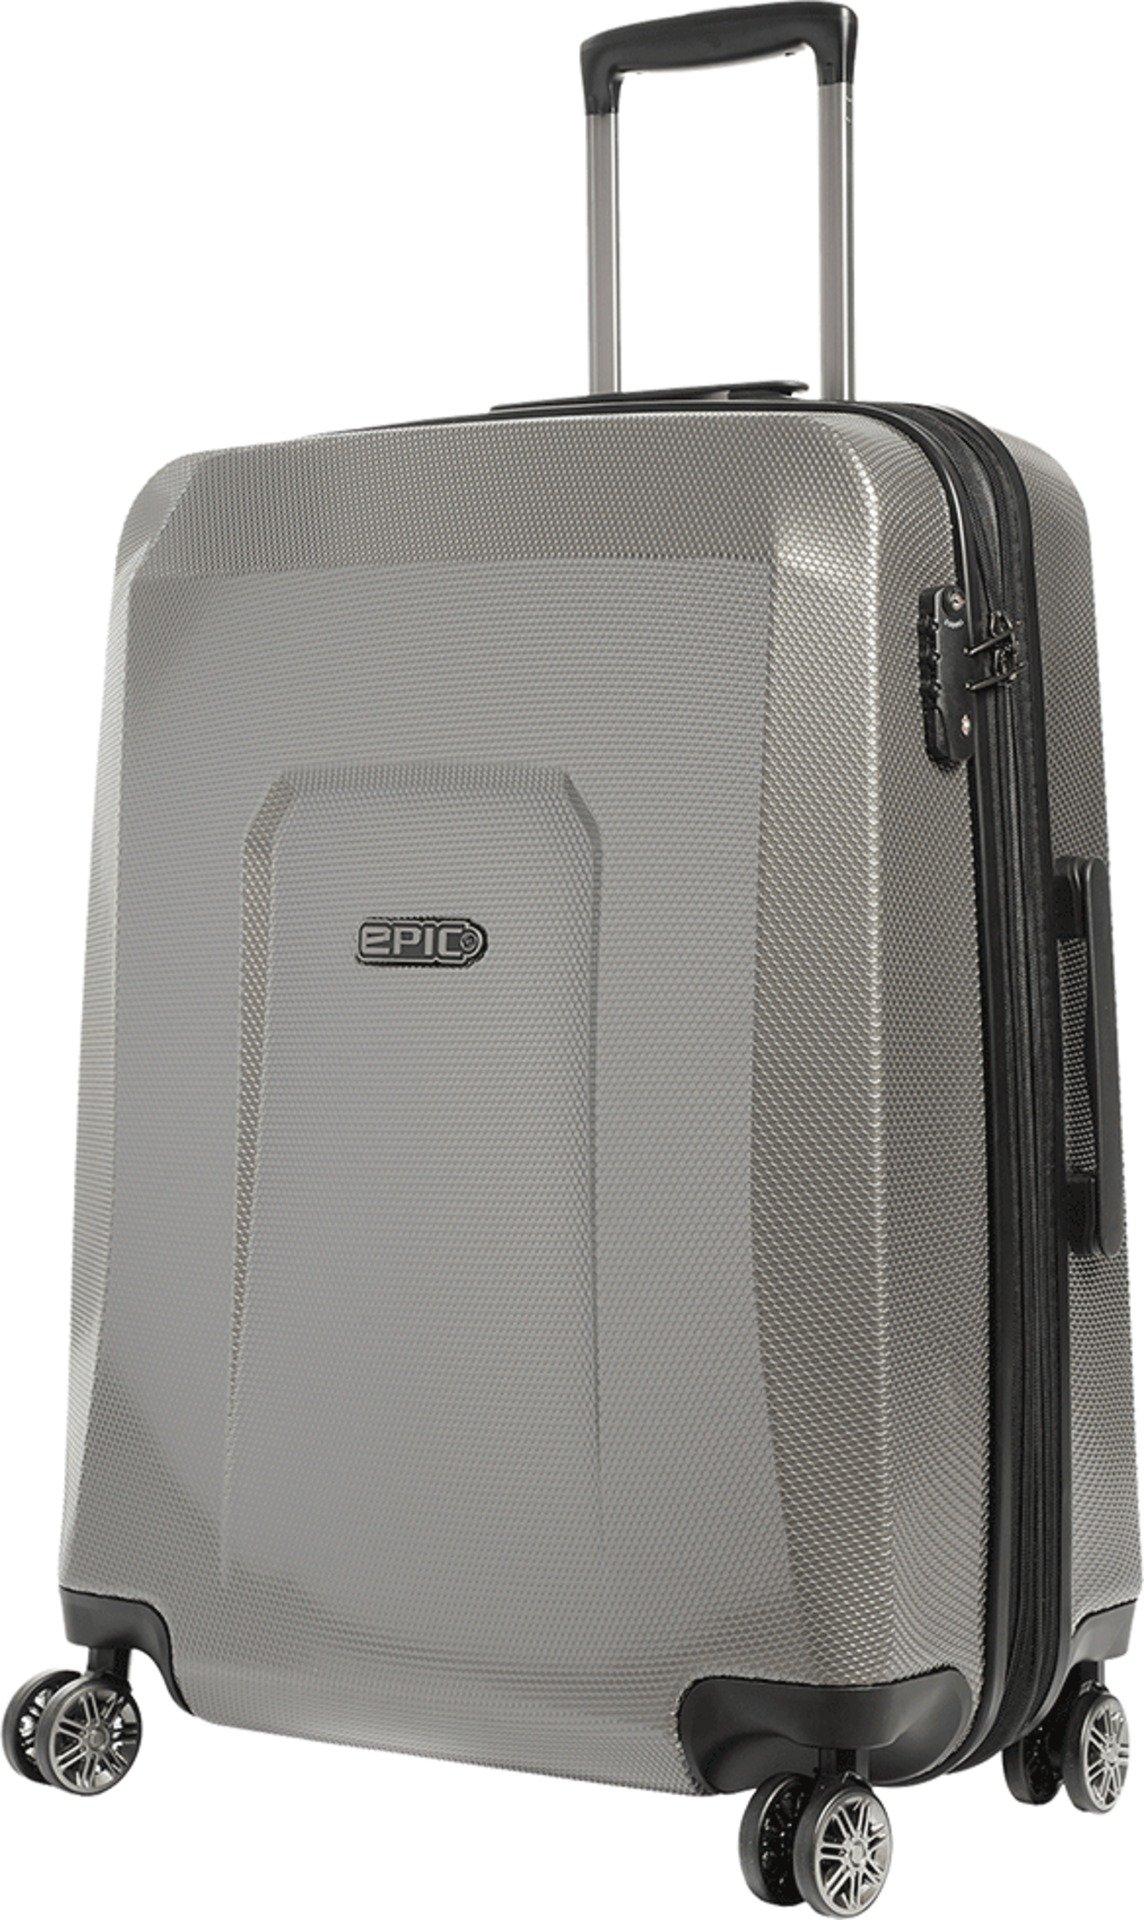 EPIC Travelgear Unisex HDX EX 29'' Trolley Dark Grey Luggage by EPIC Travelgear